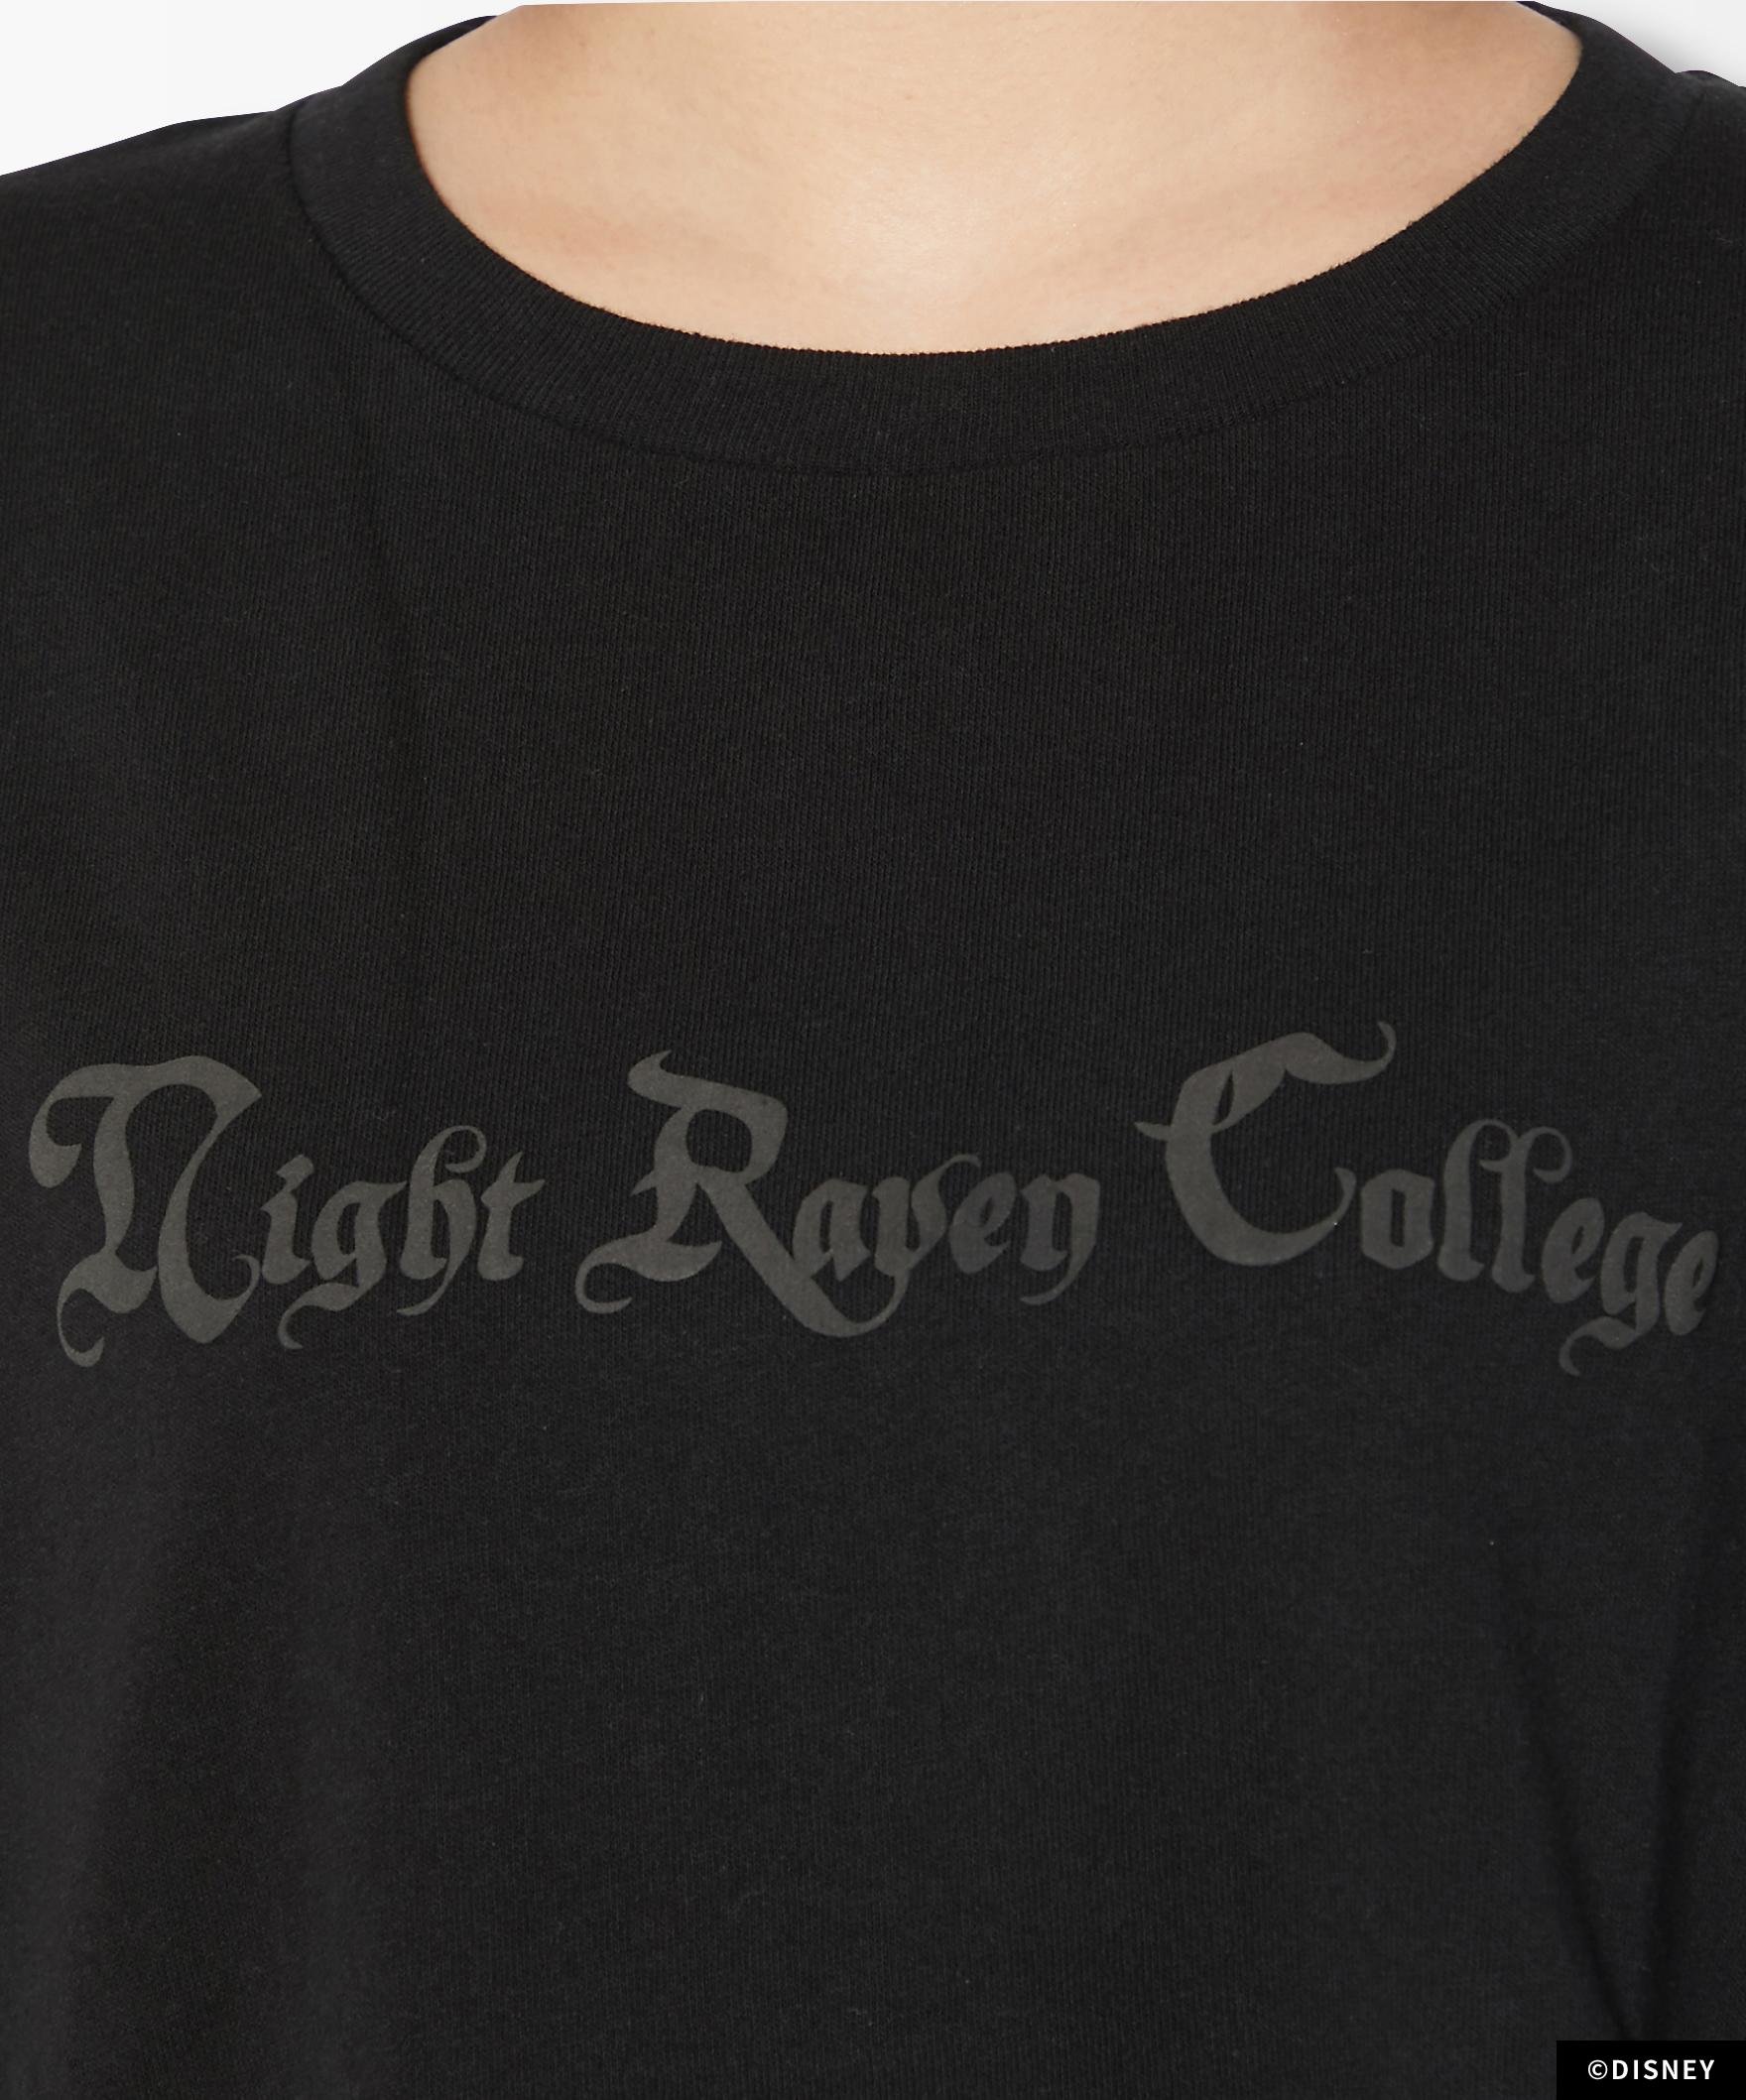 NIGHT RAVEN COLLEGE L/S